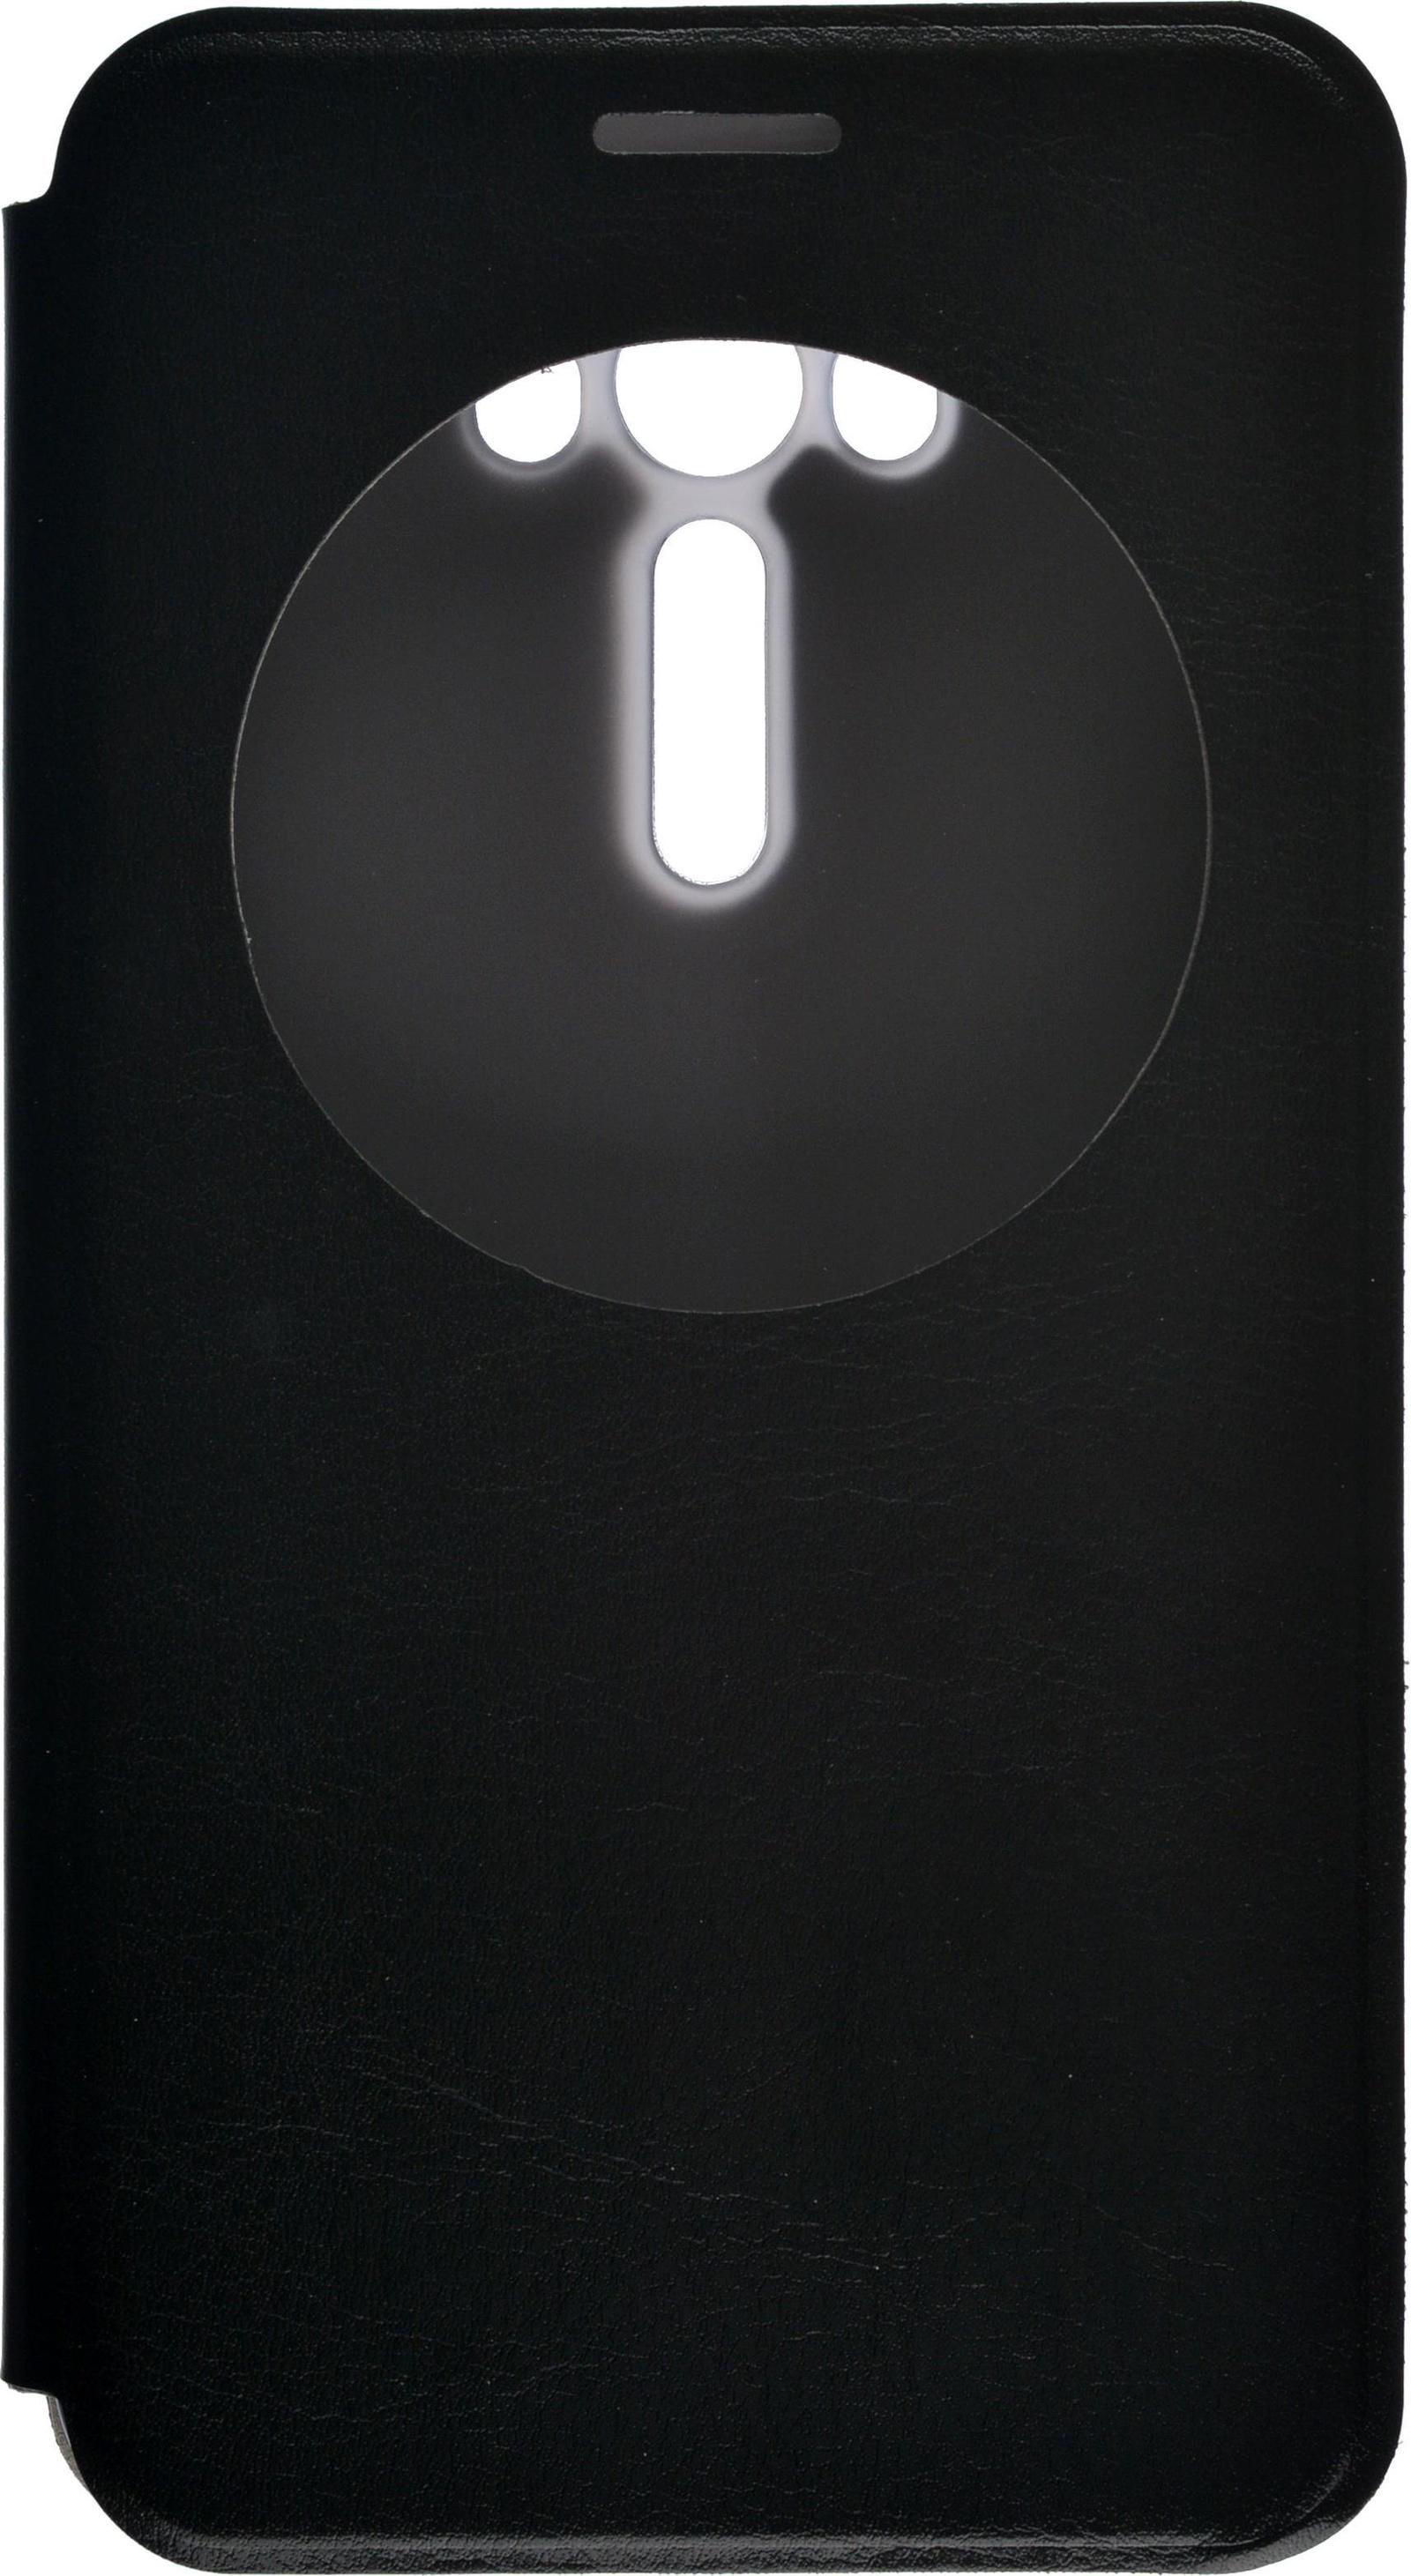 Чехол для сотового телефона skinBOX Lux AW, 4660041406948, черный roar aw чехол для asus zenfone 4 a400cg white